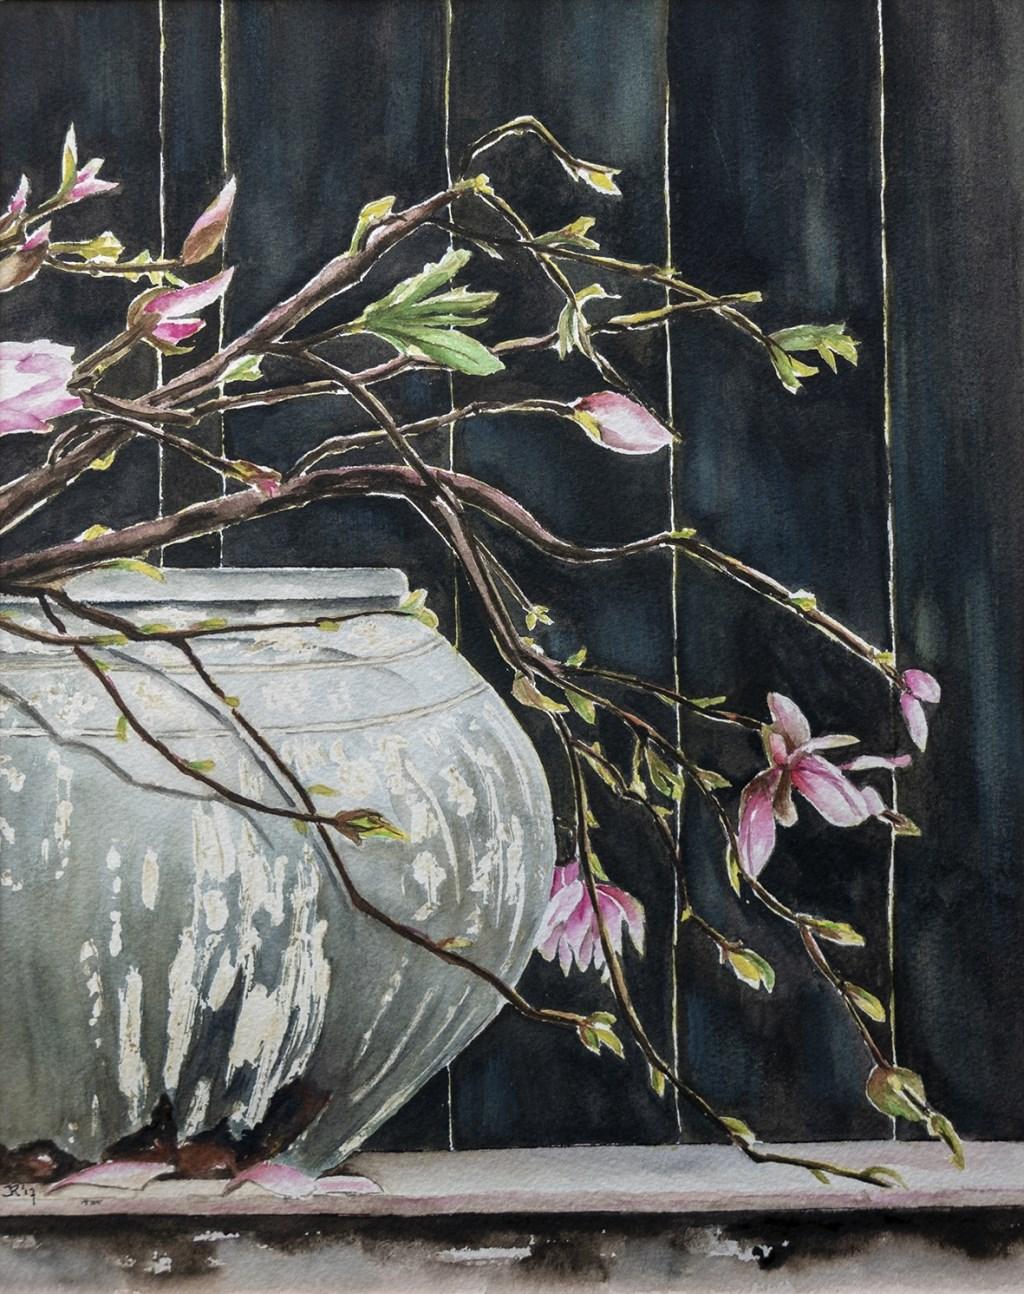 Vaas met magnolia's Foto: Hans Hendriks © DPG Media